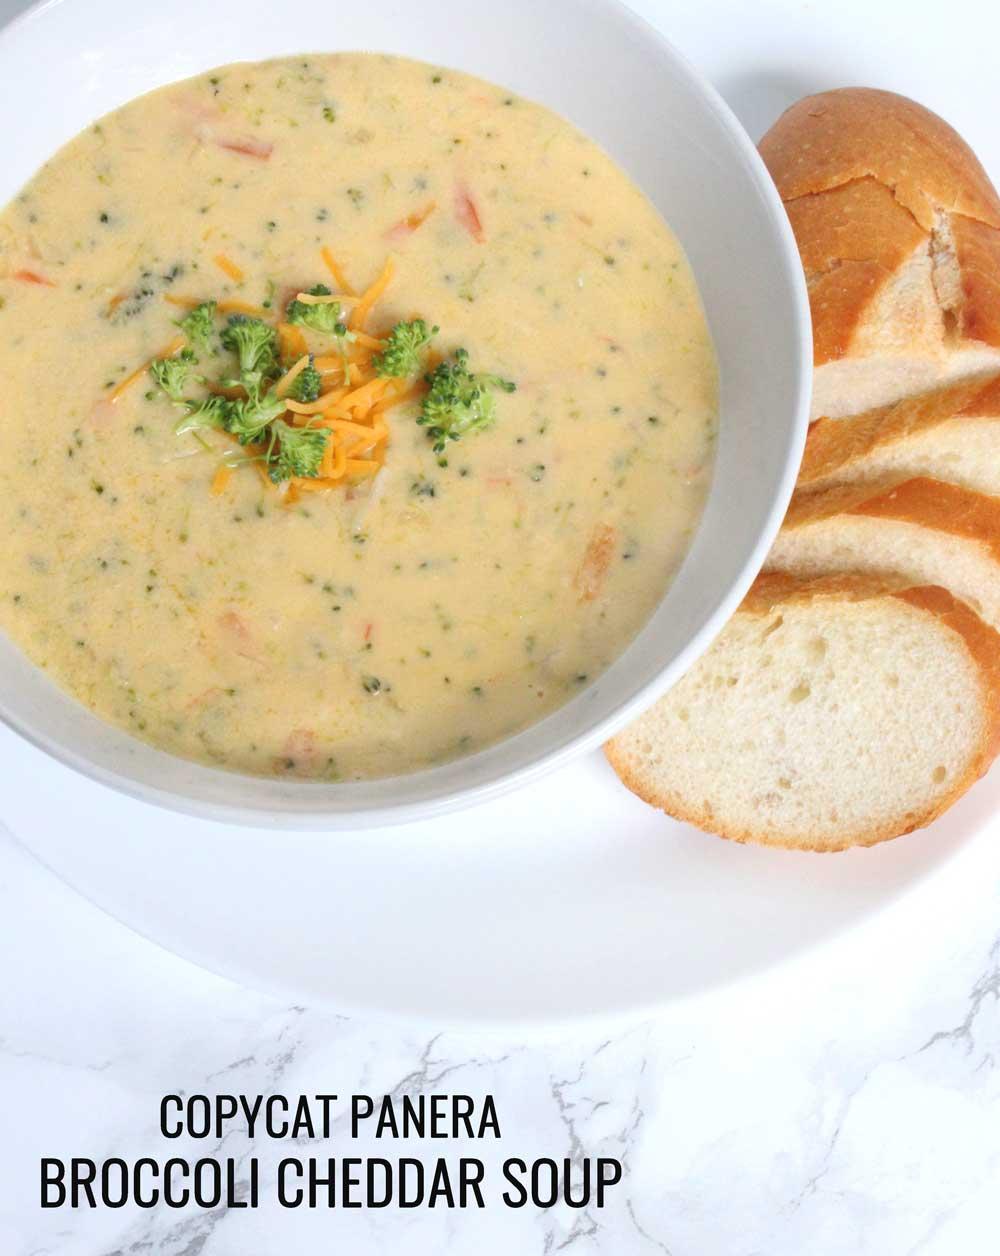 panera-broccoli-cheddar-soup